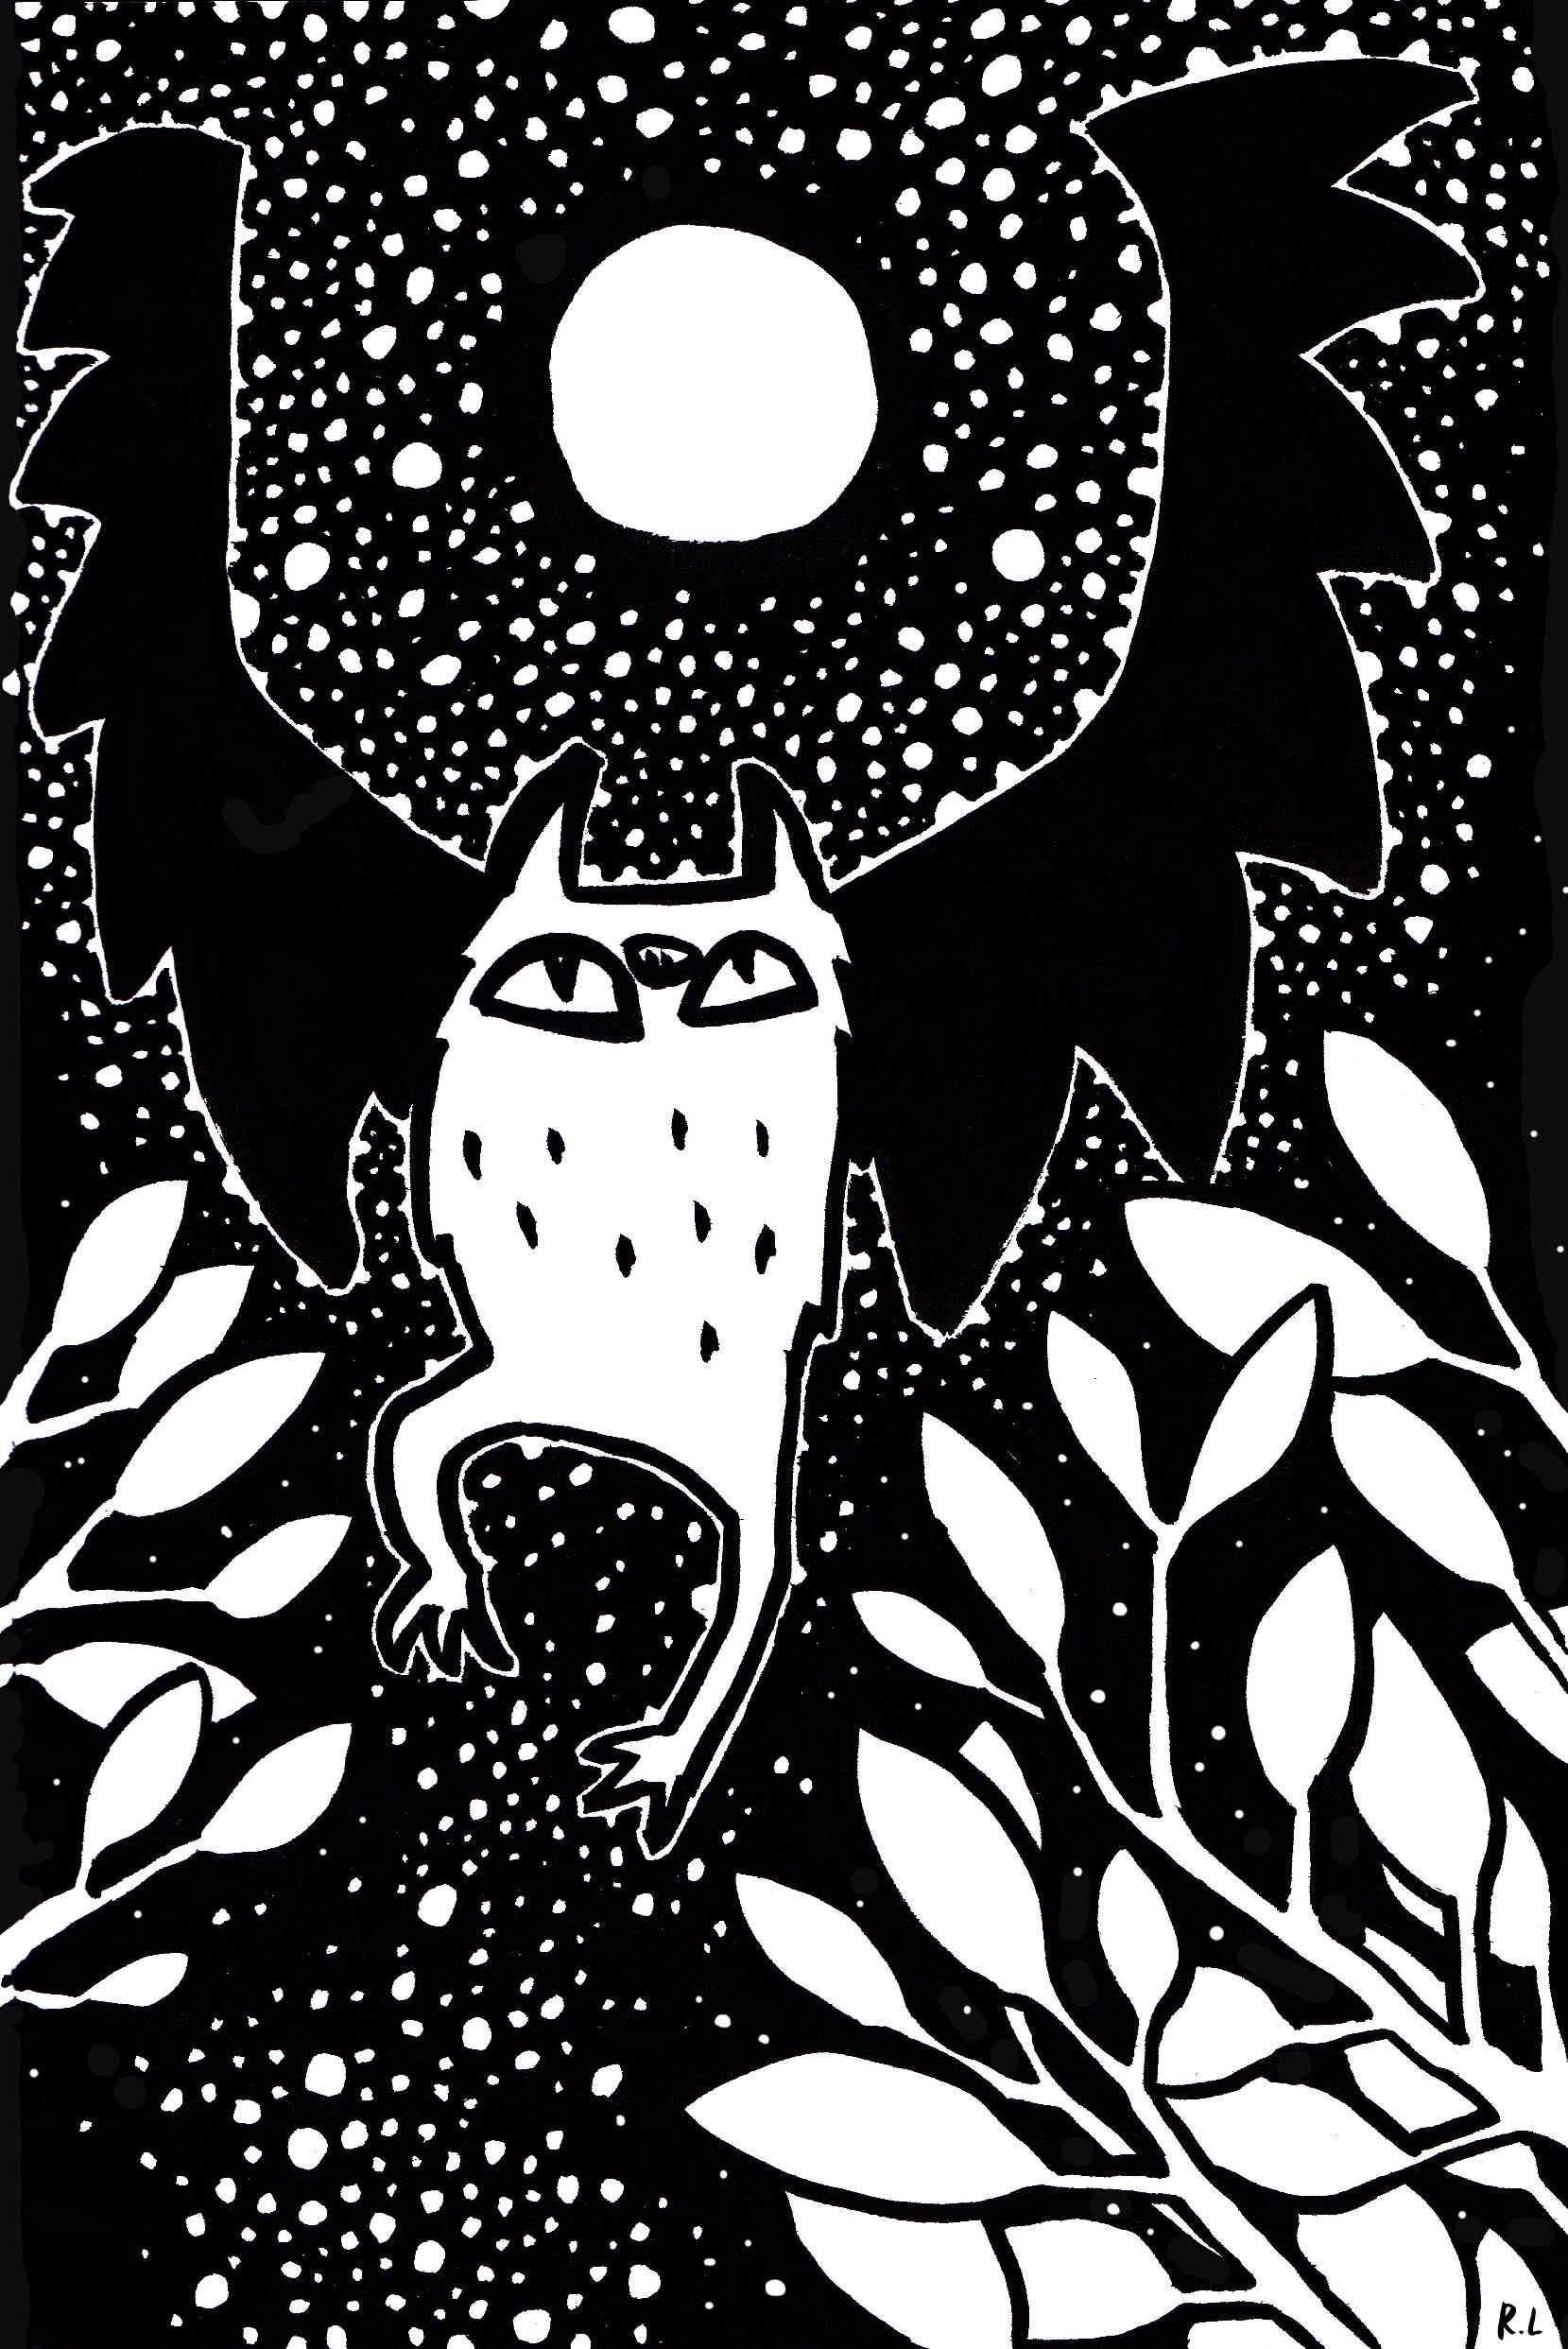 rachel logan illustration star bat night black and white.jpg